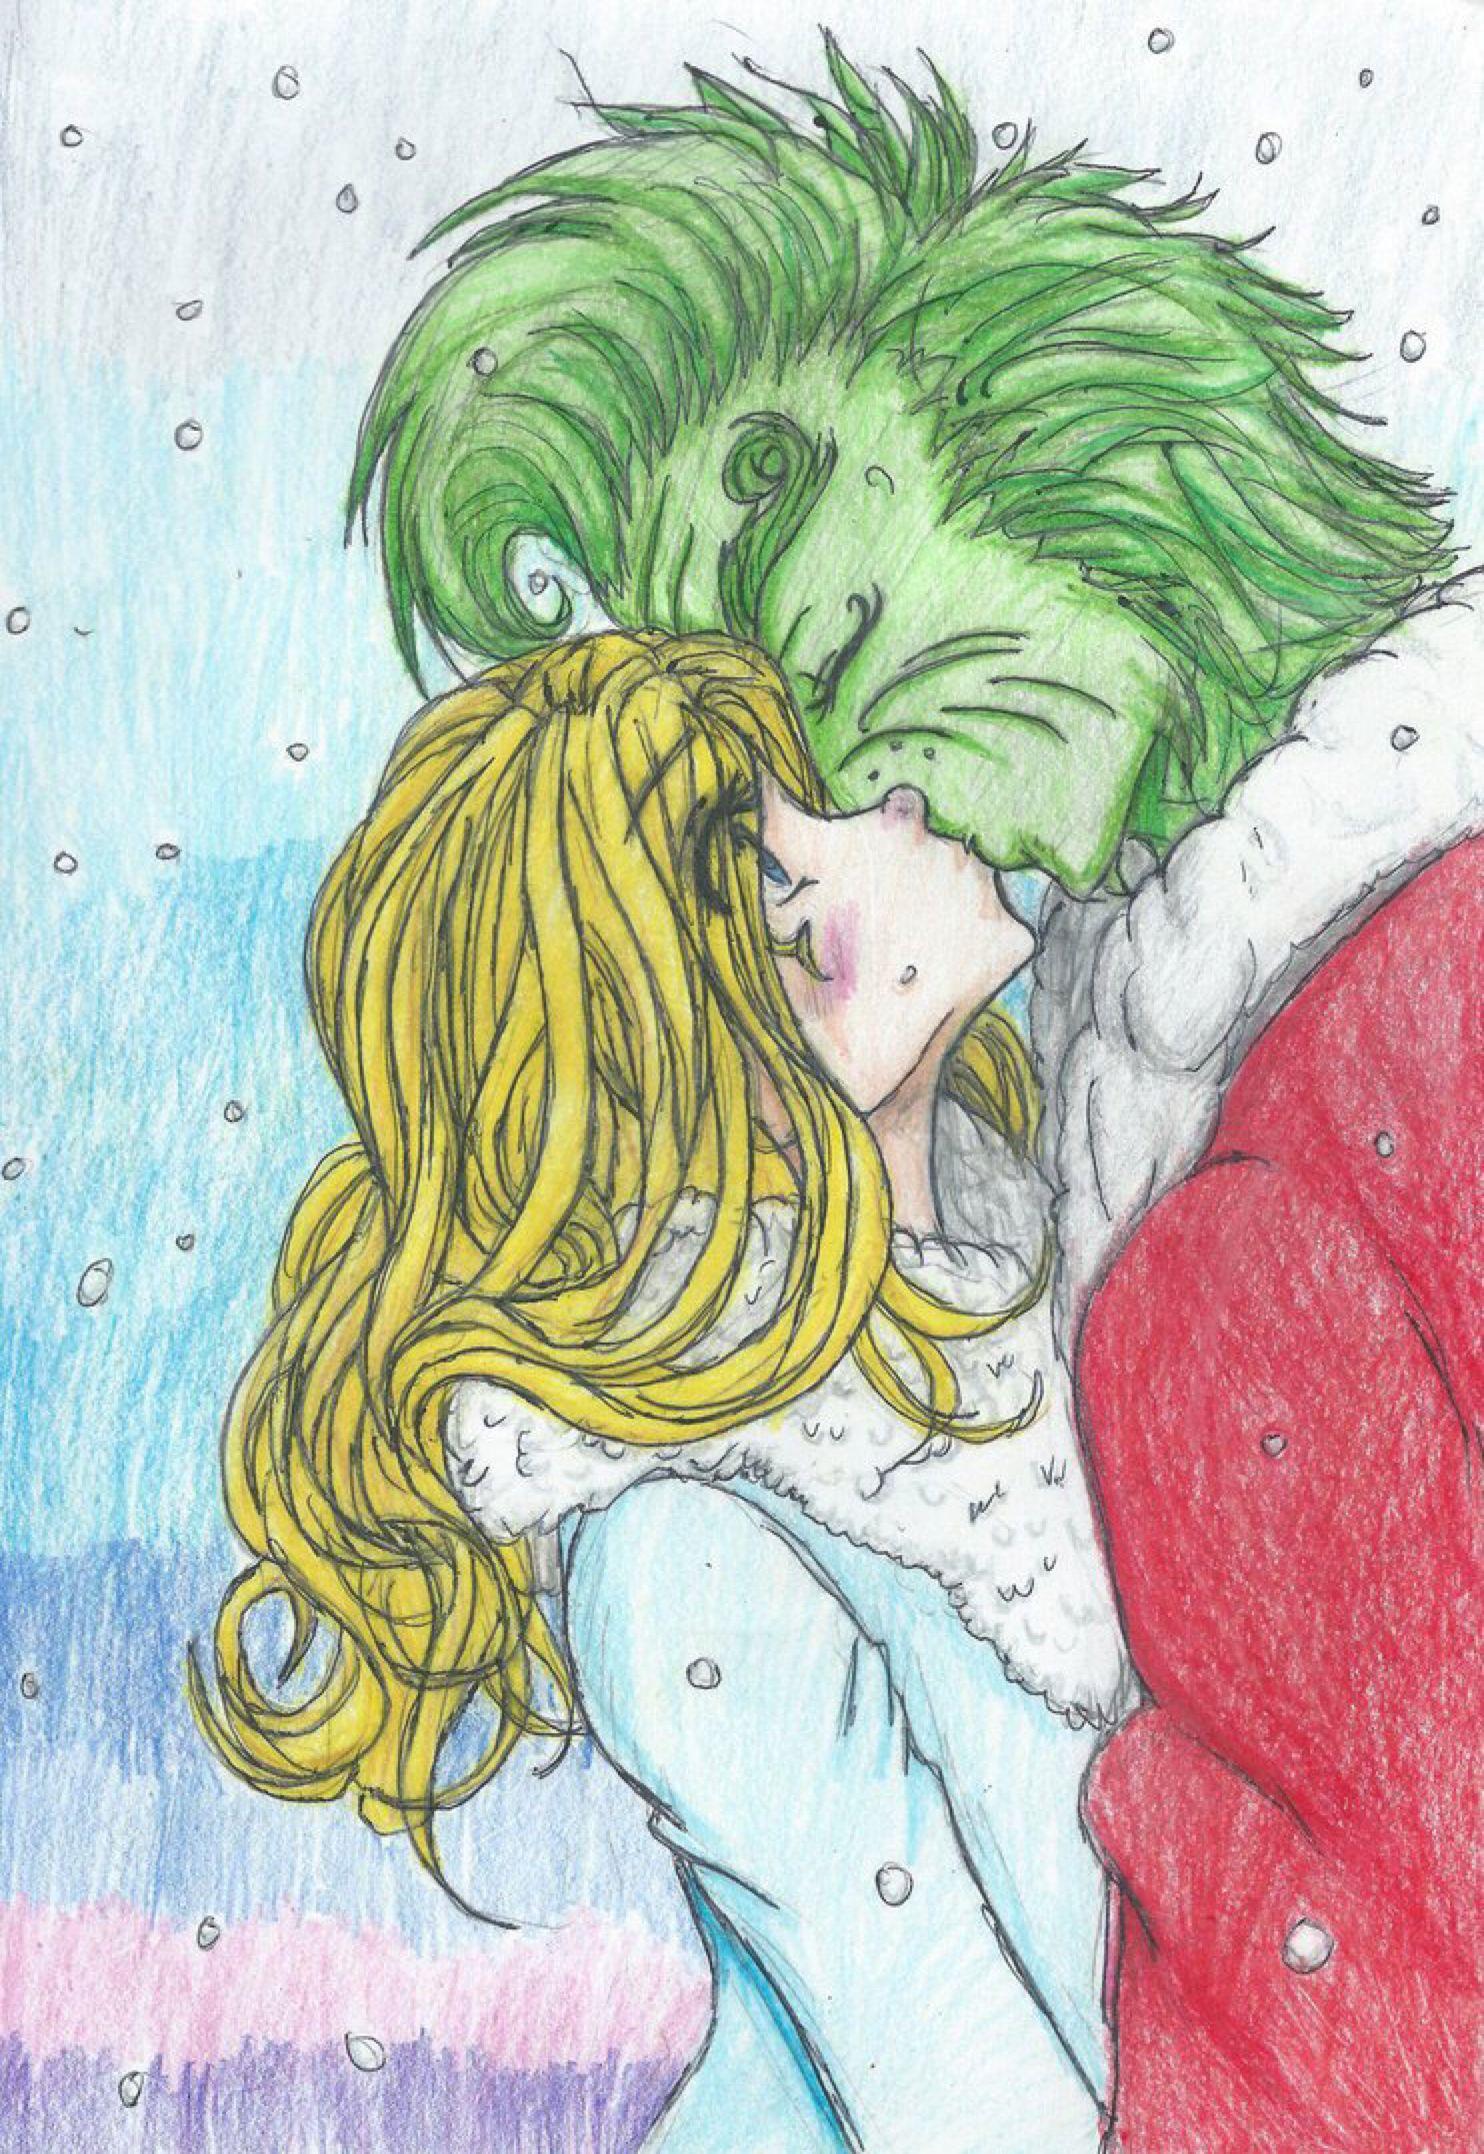 8cb3607461b6a How the Grinch Stole the Christmas Kiss by Inubaki on  DeviantArt ...